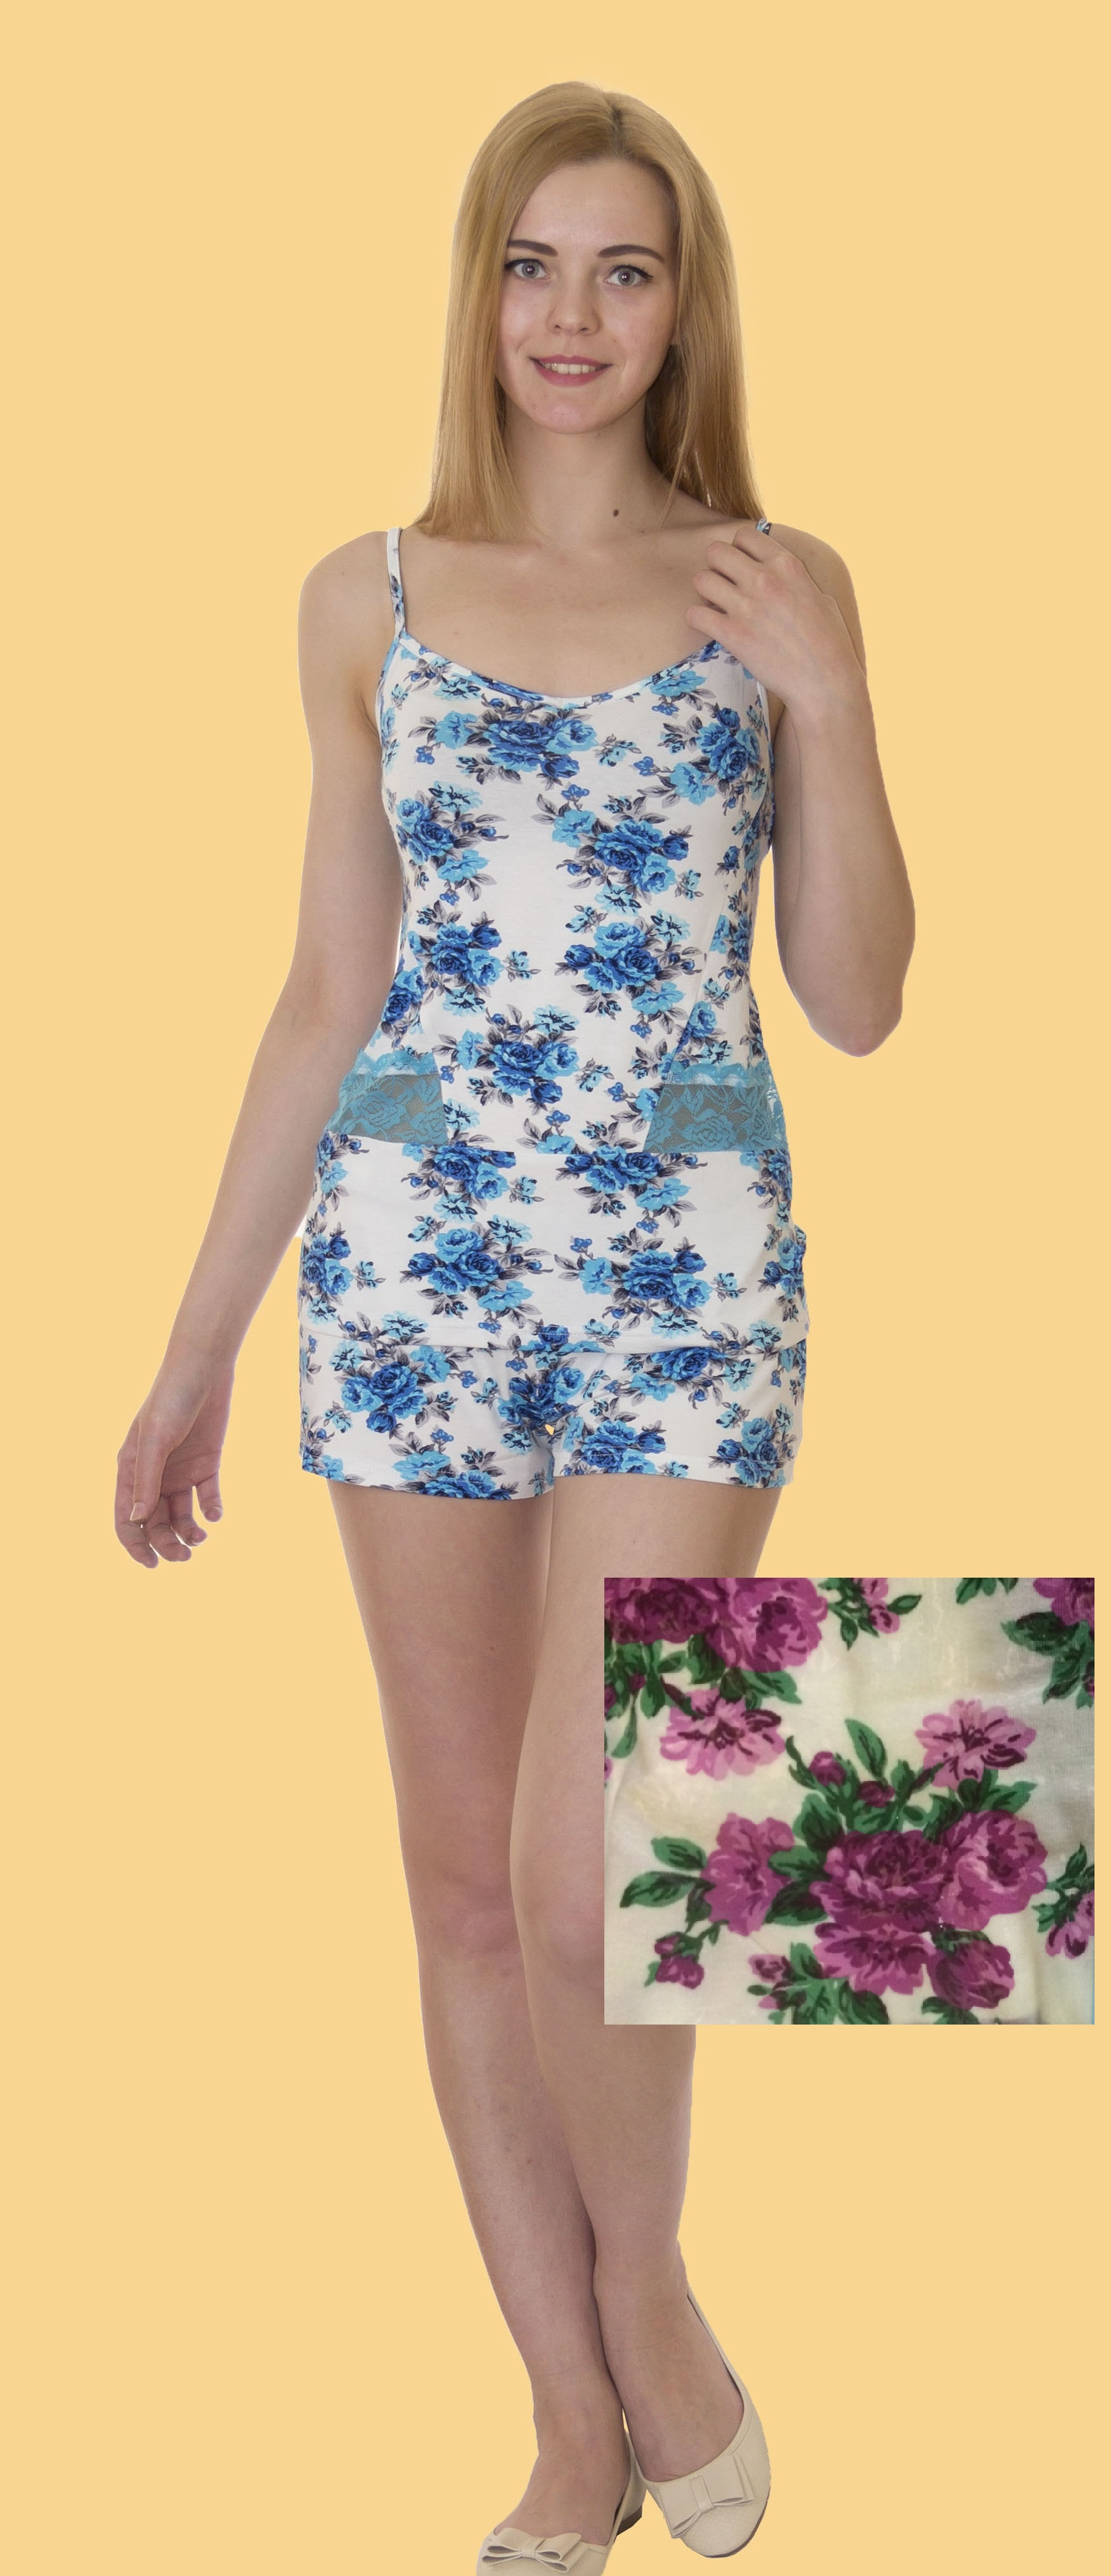 Пижамы Лотос Пижама Ассоль Цвет: Розовые Цветы (L) пижама жен mia cara майка шорты botanical aw15 ubl lst 264 р 42 44 1119503